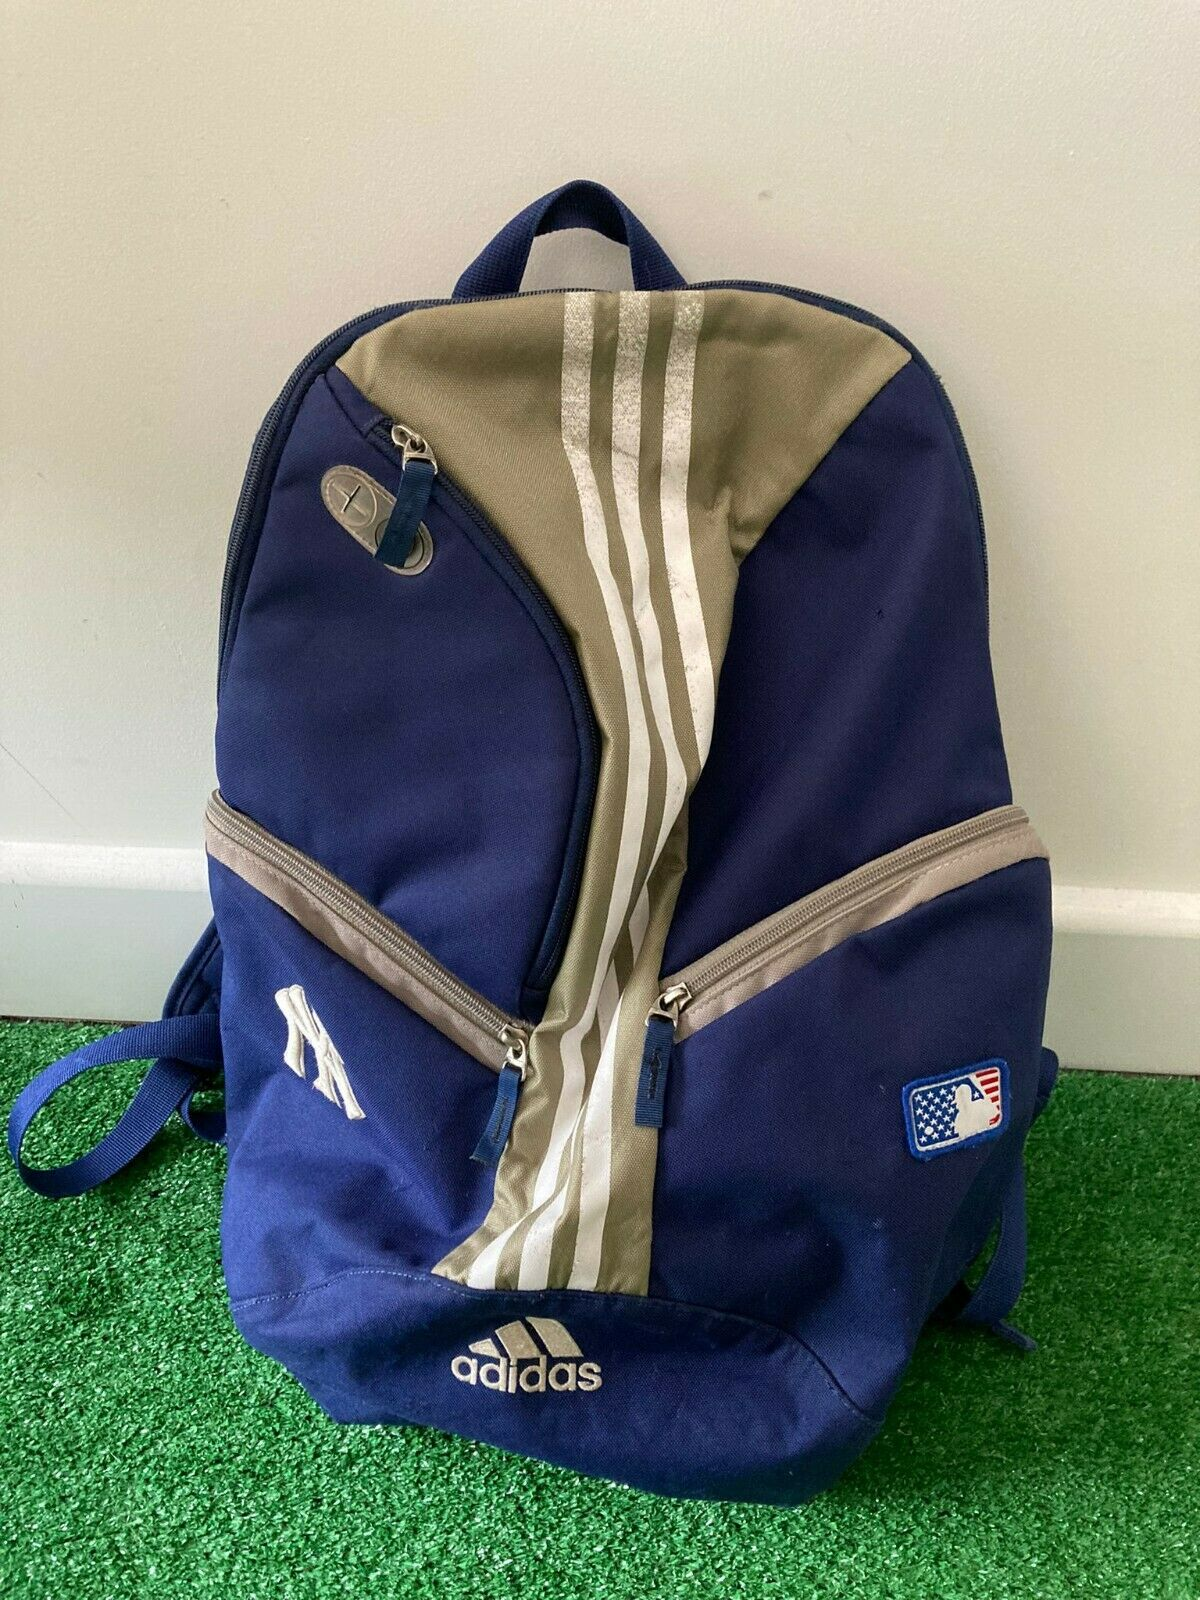 Retro Adidas NY Yankees Backpack Bag Rucksack Blue & Gold With White Stripes